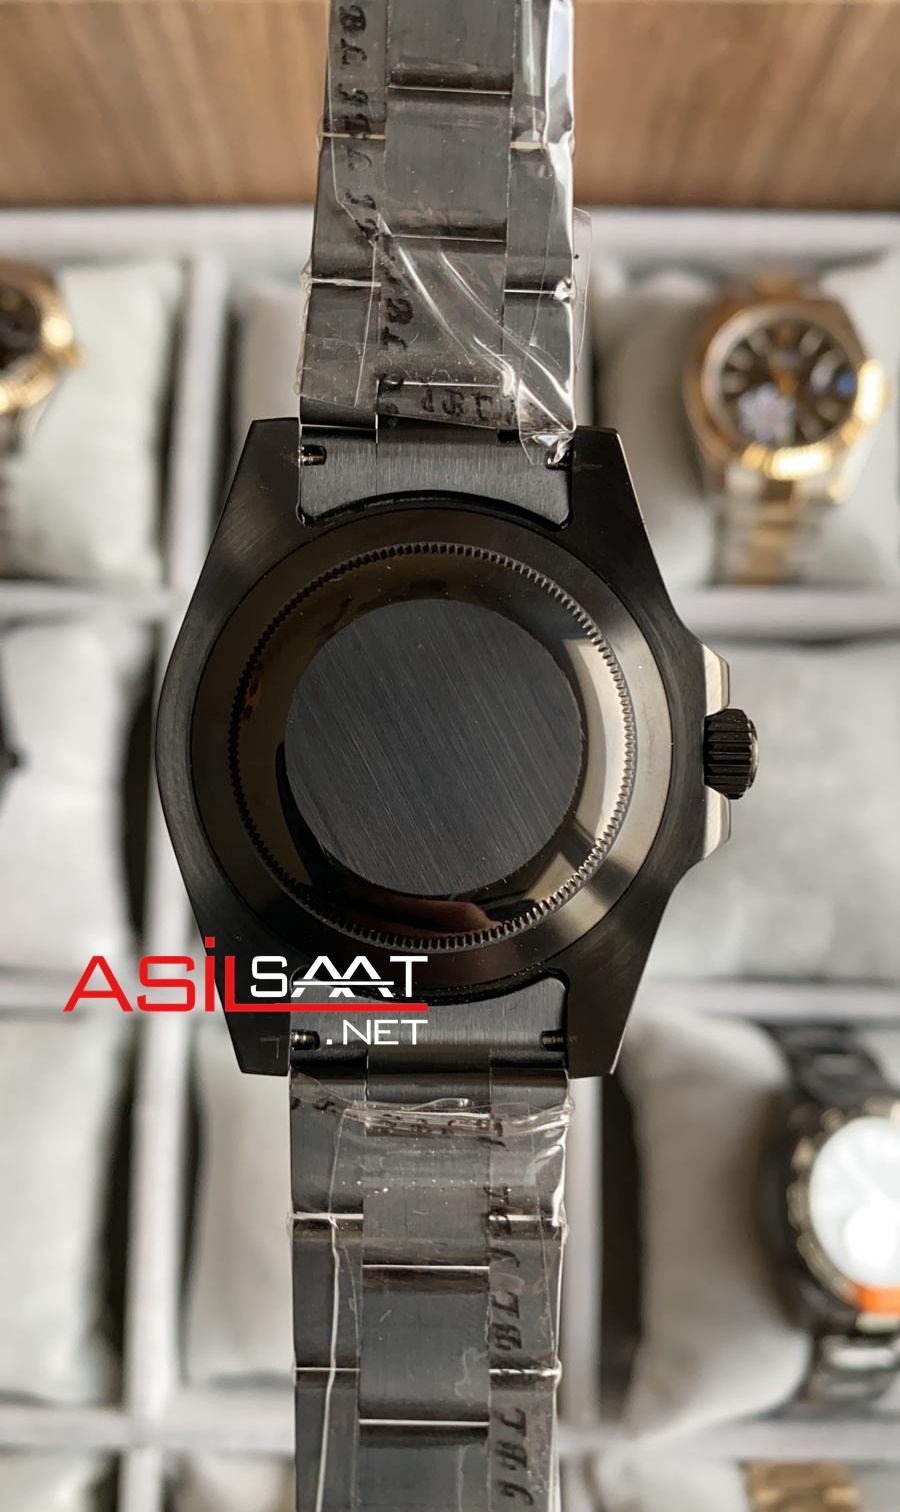 Rolex Oyster Perpetual Gmt Master II Batman Black Replika Saat ROLG009